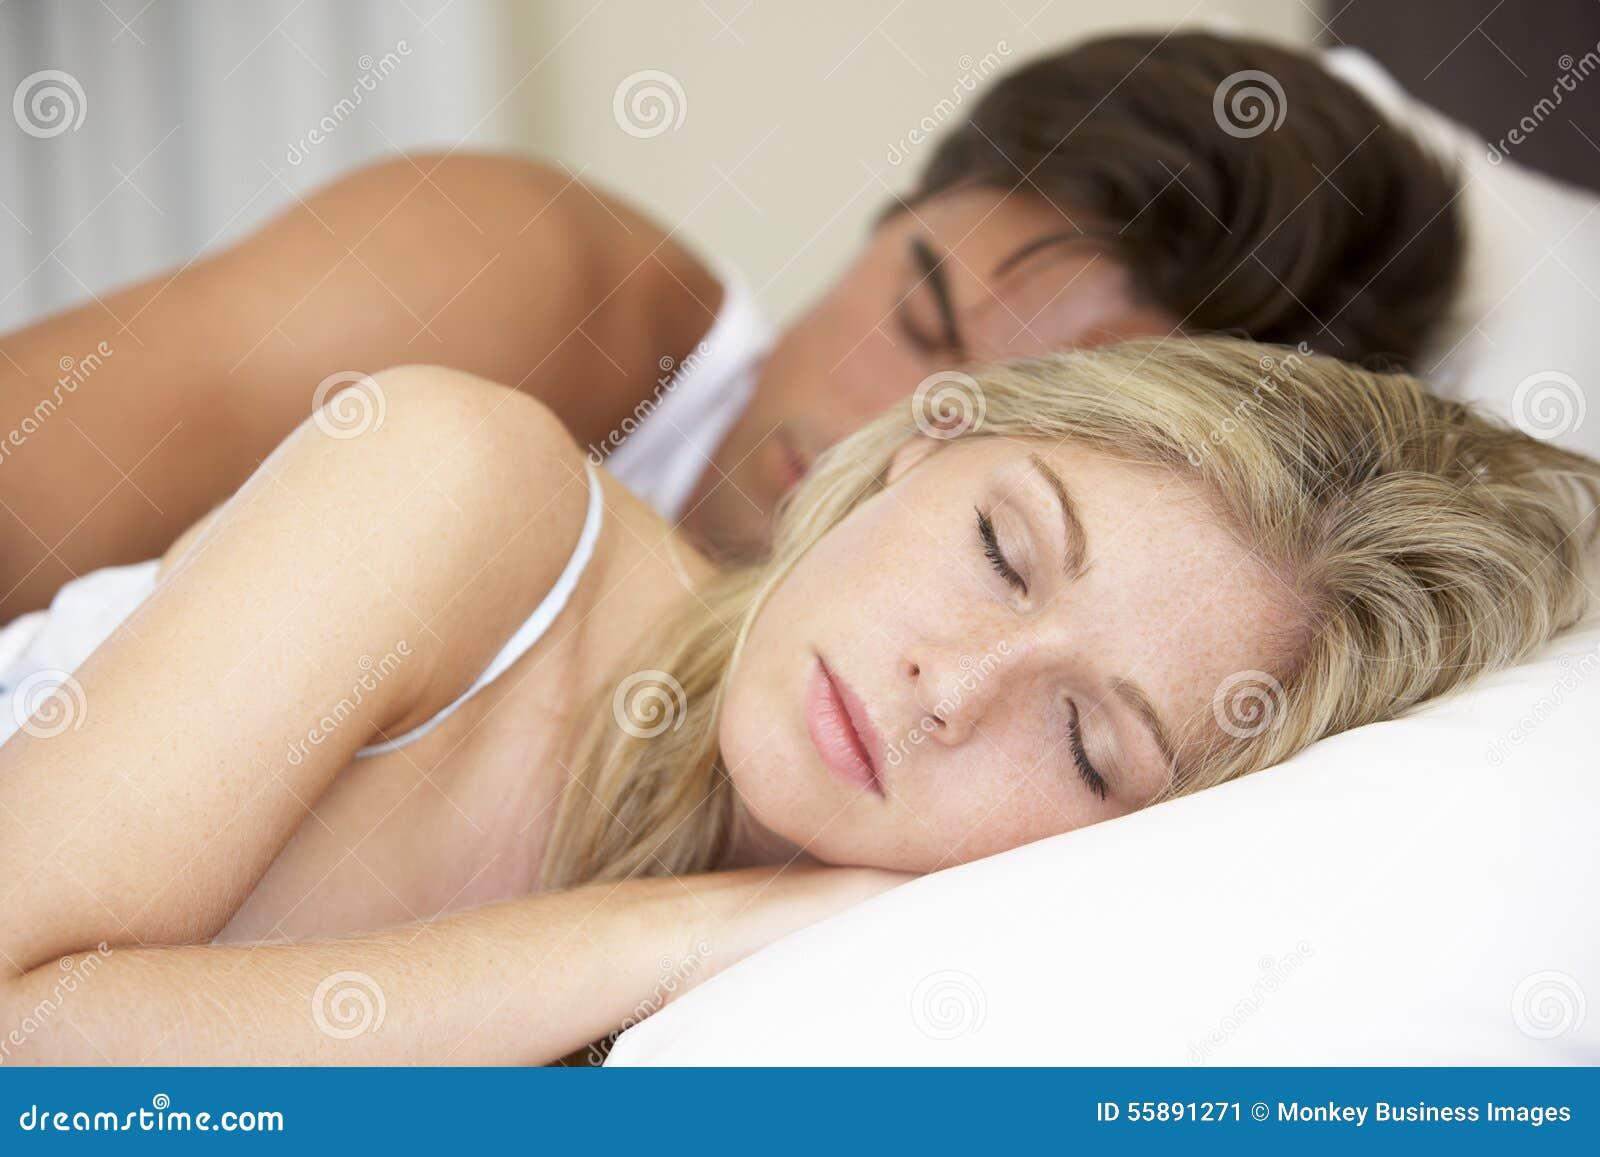 Young Couple Sleeping On Bed